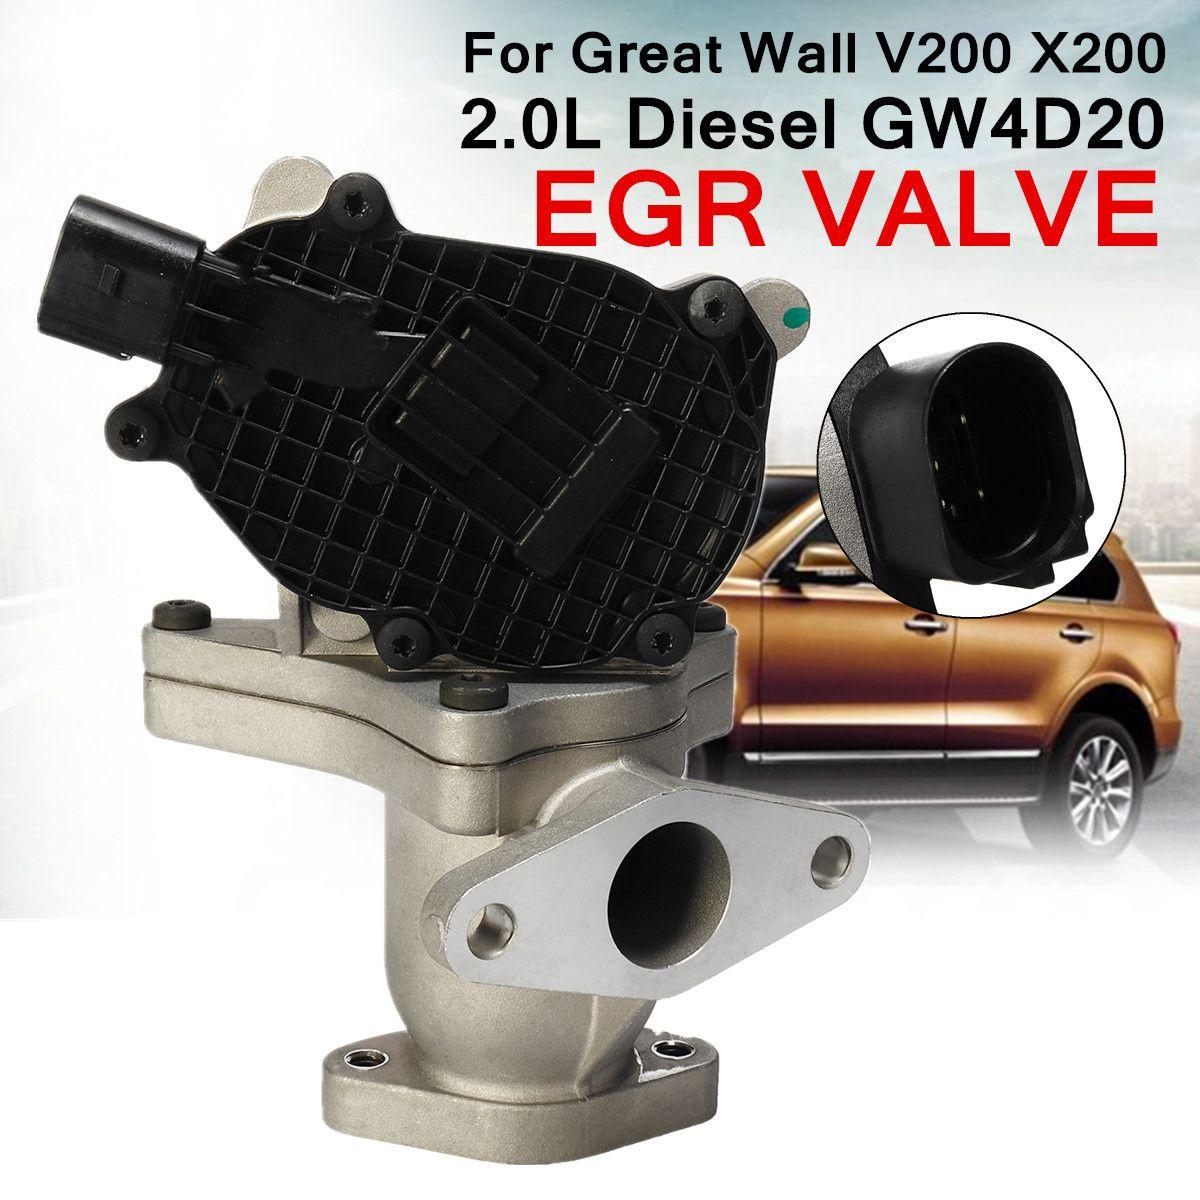 EGR Exhaust Gas Valve for Great Wall 1207100-ED01A V200 X200 2.0L for Diesel GW4D20 Recirculation Valve Reduce Temperature NOx